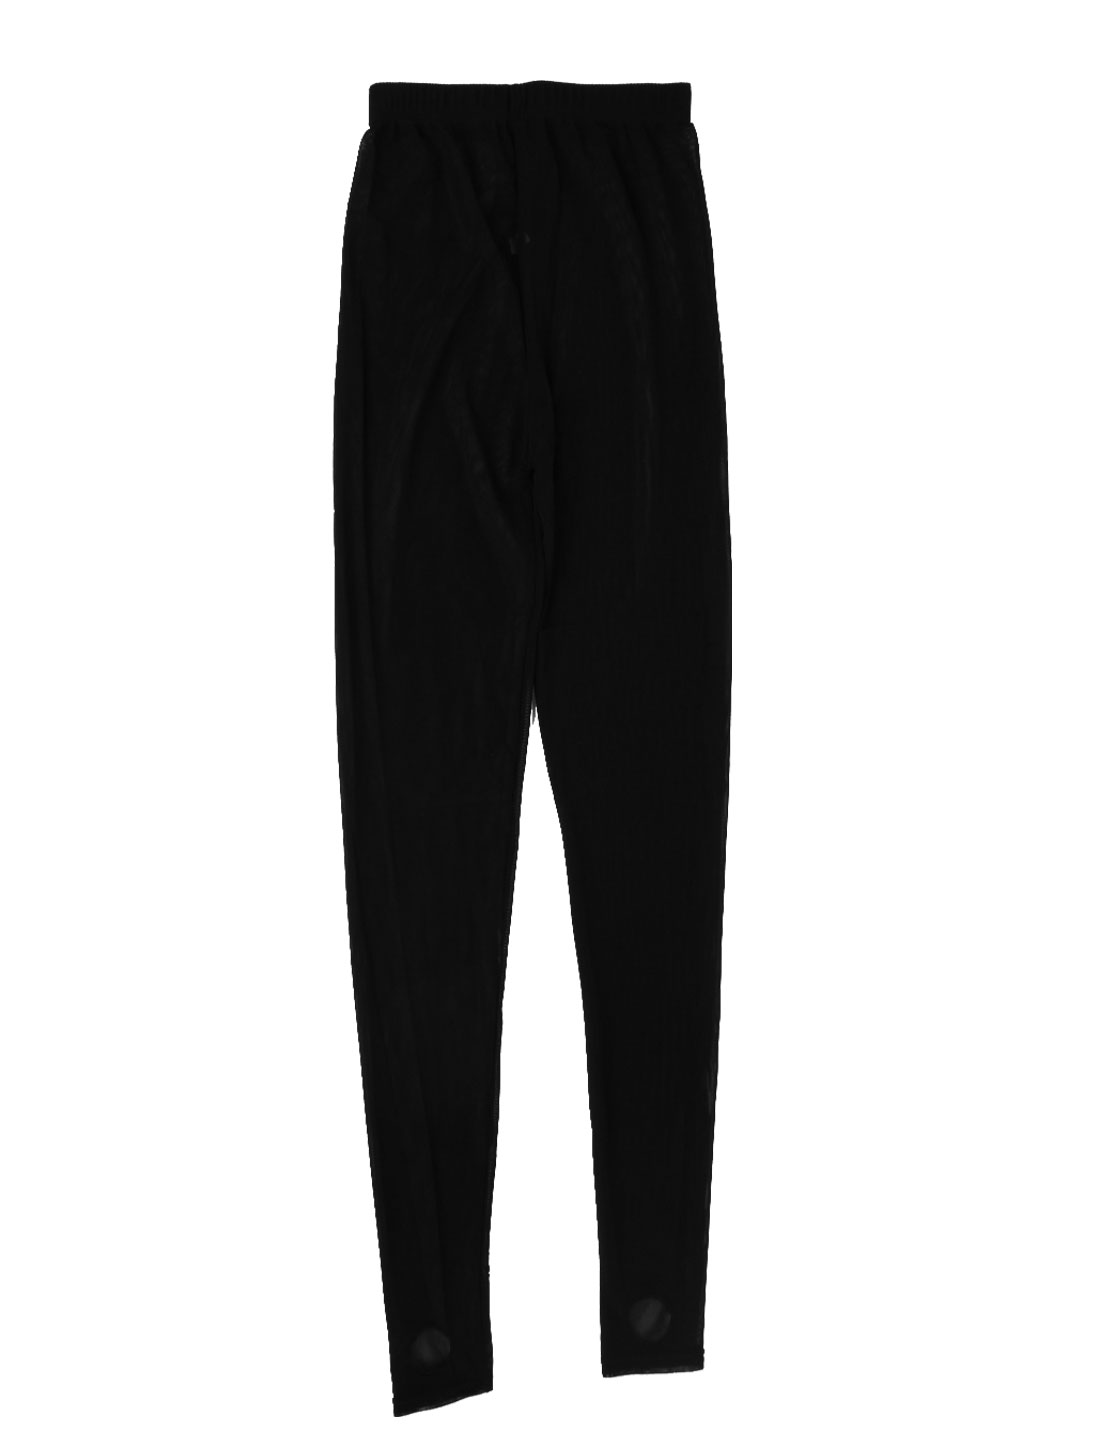 Lady Black Close Fitting Semi Sheer Leggings Mesh Stretch Stirrup Pantyhose US 0